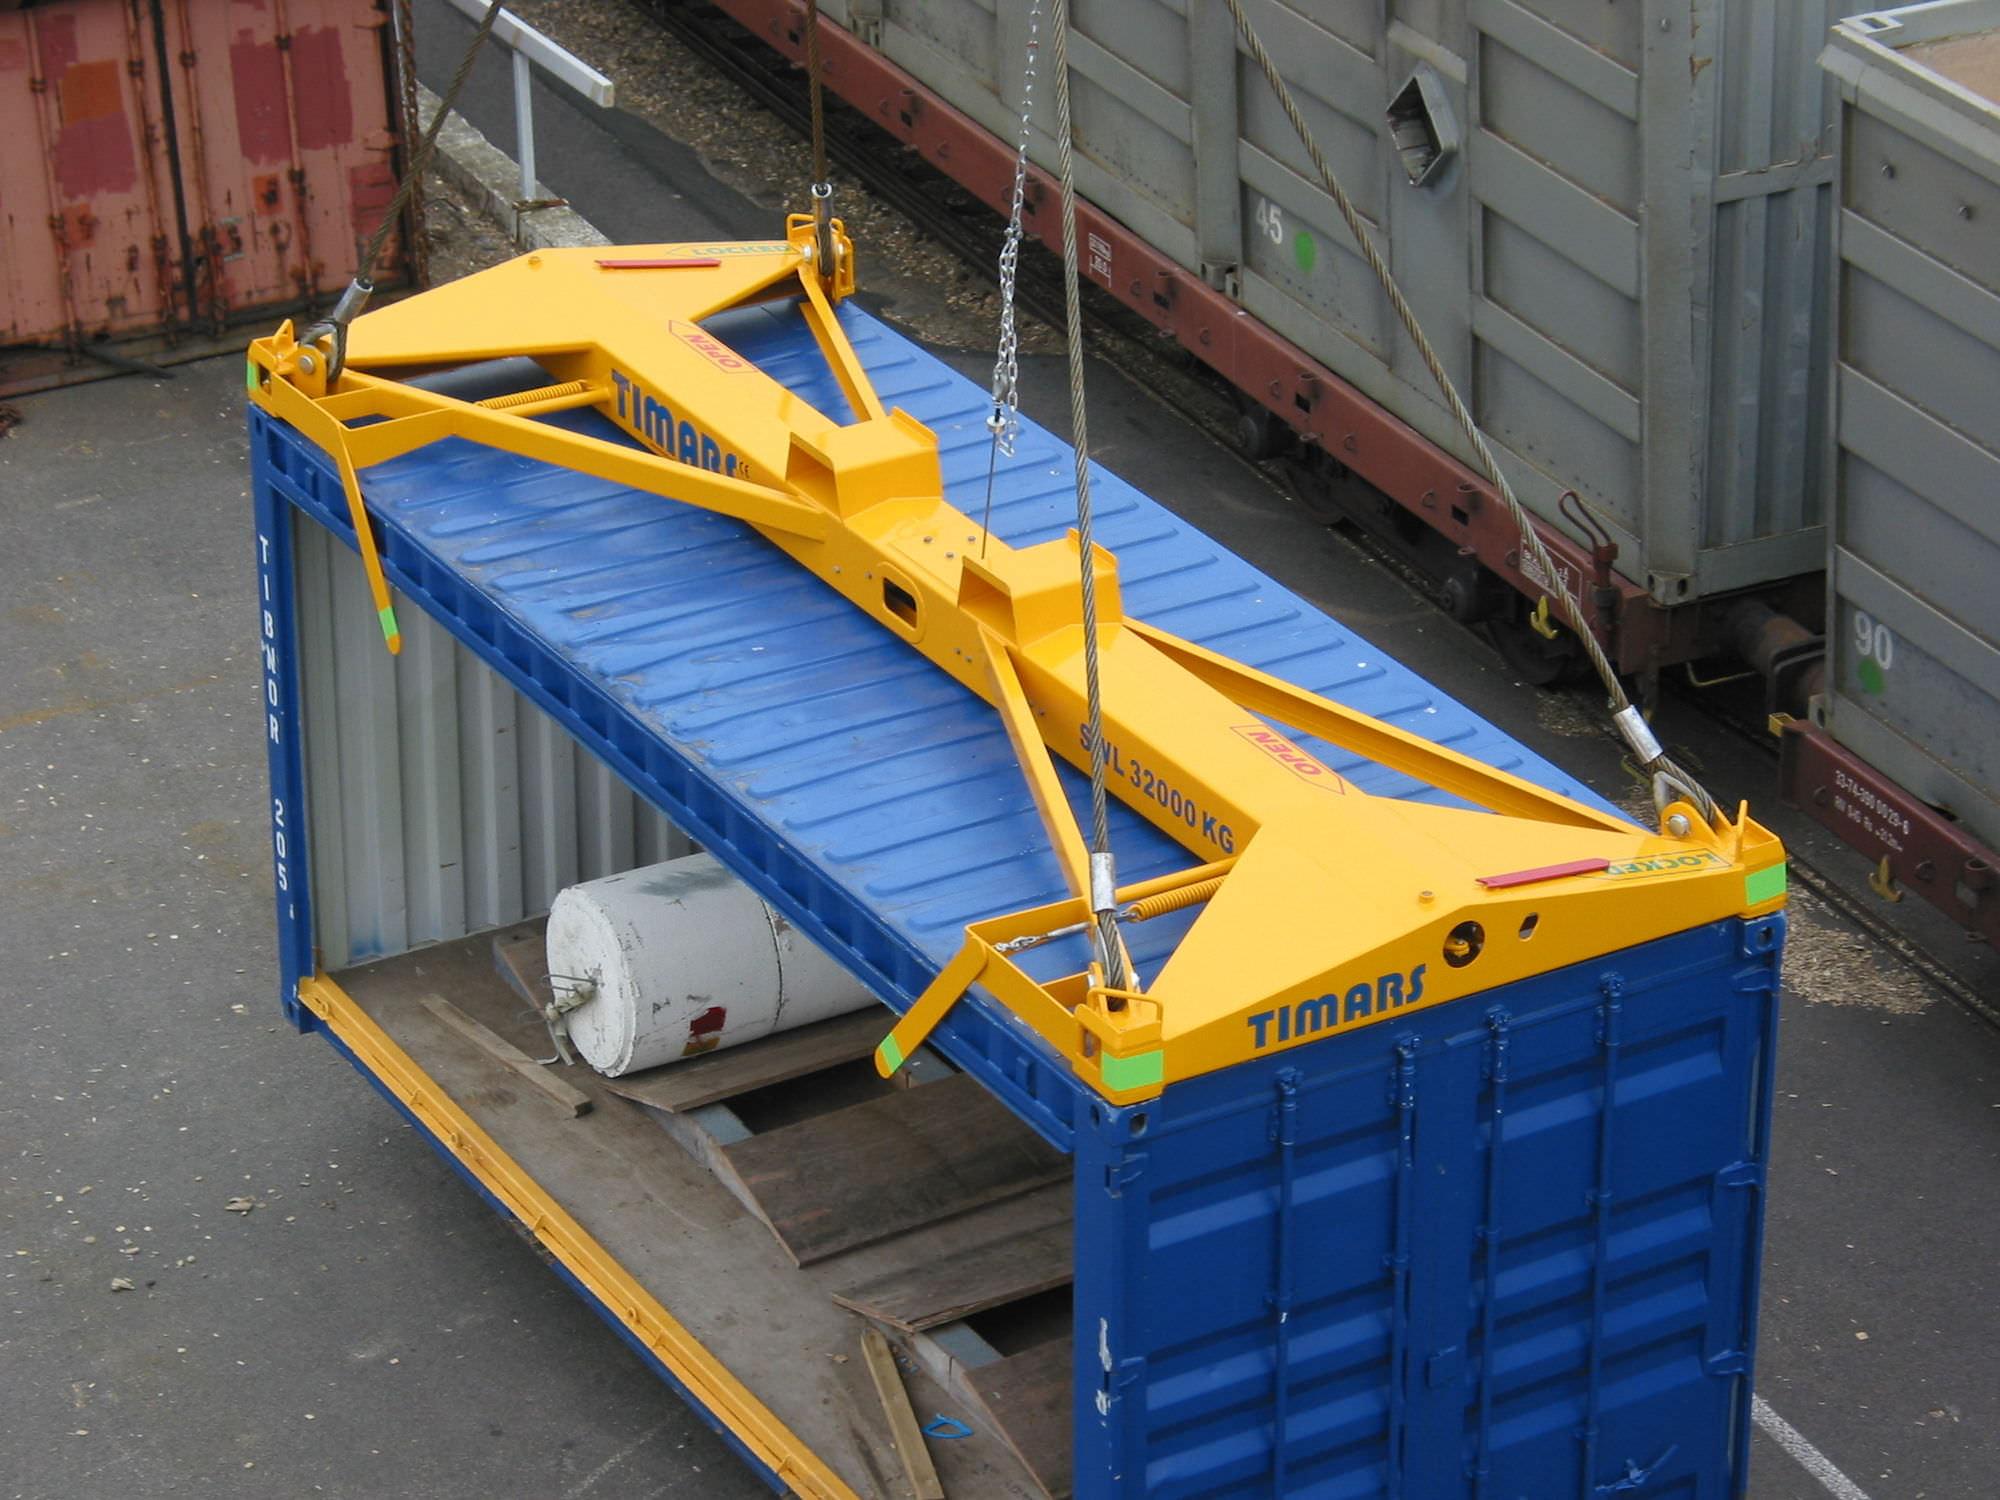 container spreader semi automatic c lift series timars ab